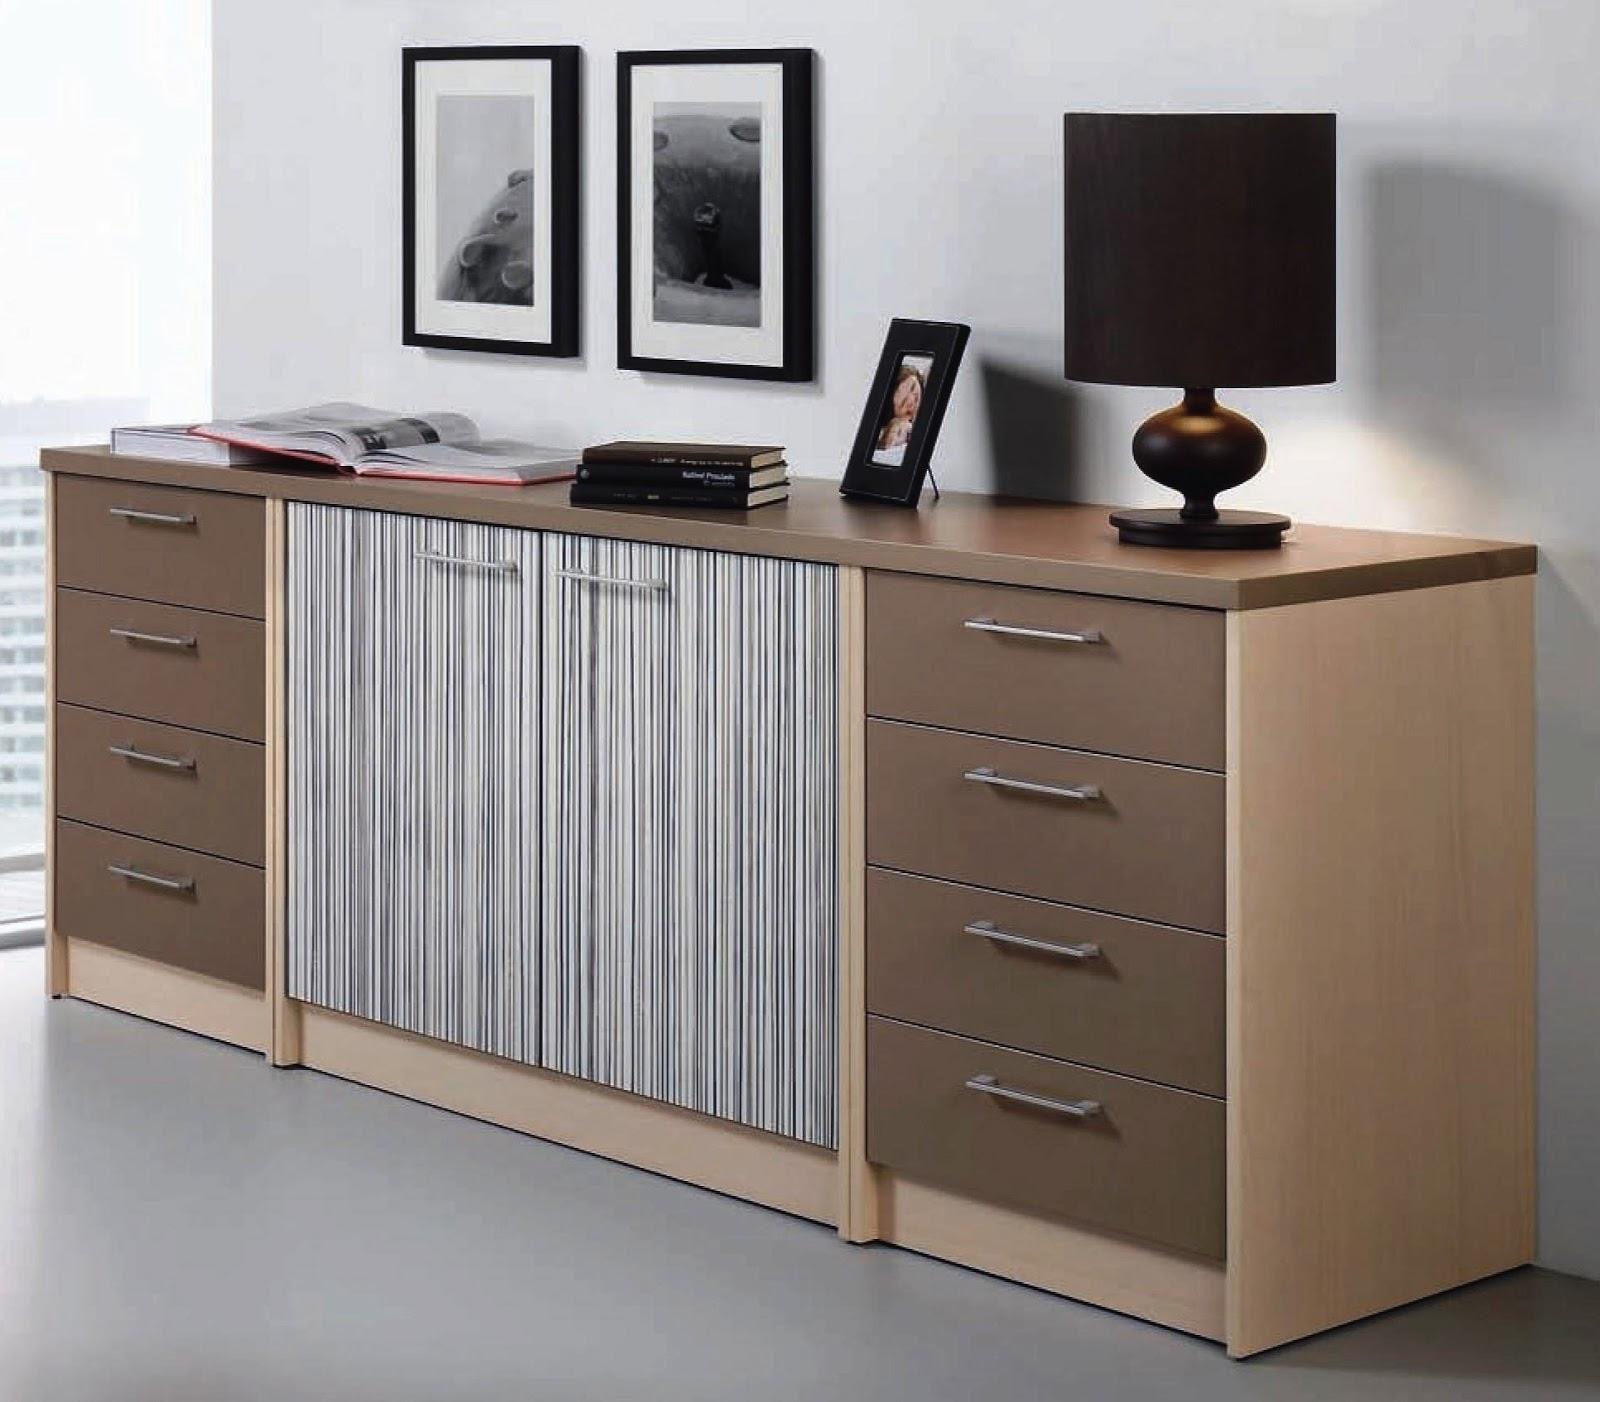 Muebles a medida de oficina